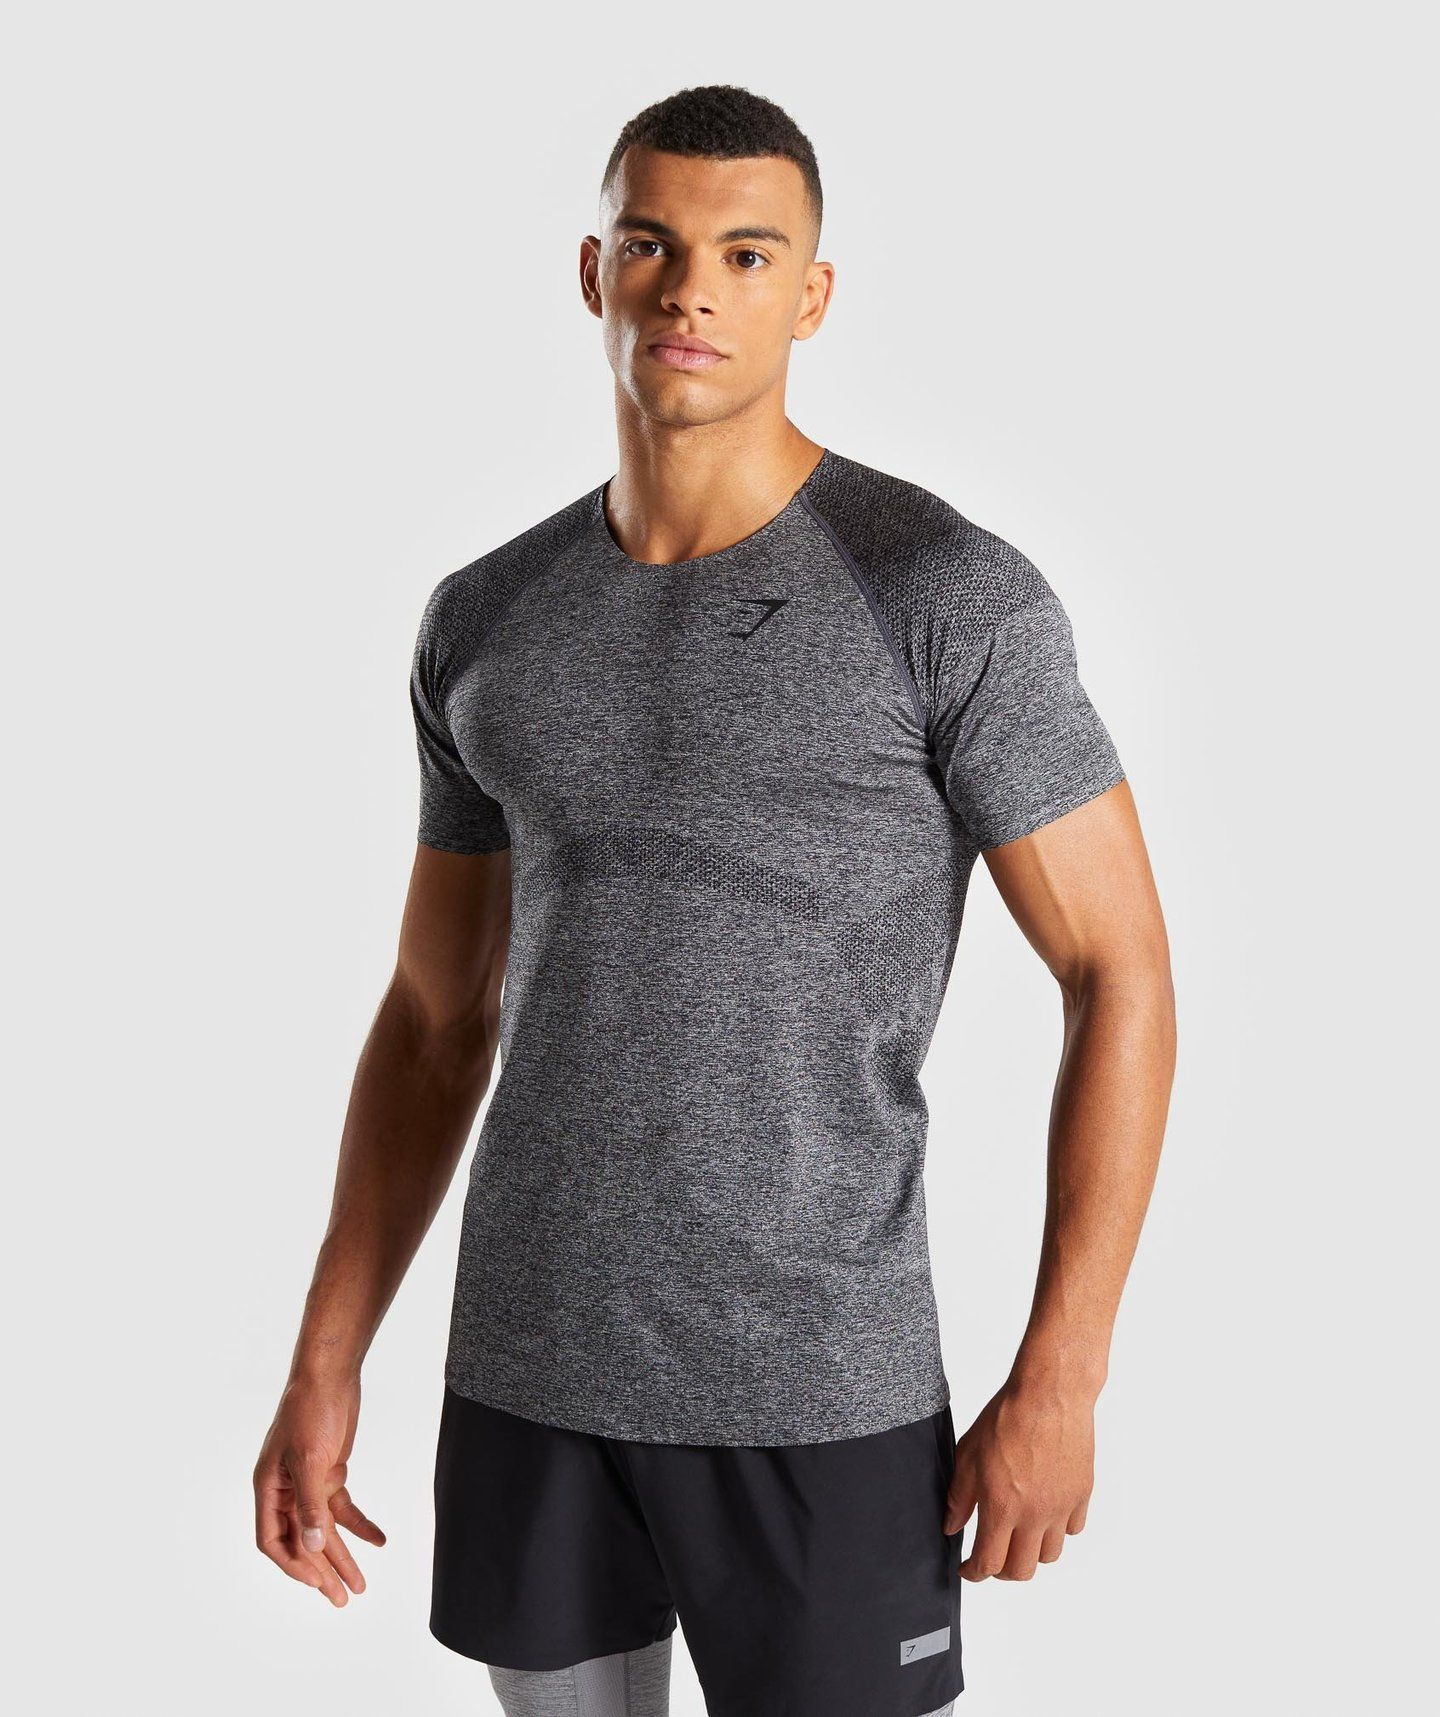 bc5c84b398acd Gymshark Shadow Seamless T-Shirt - Black Marl | Clothing | Shirts, T ...